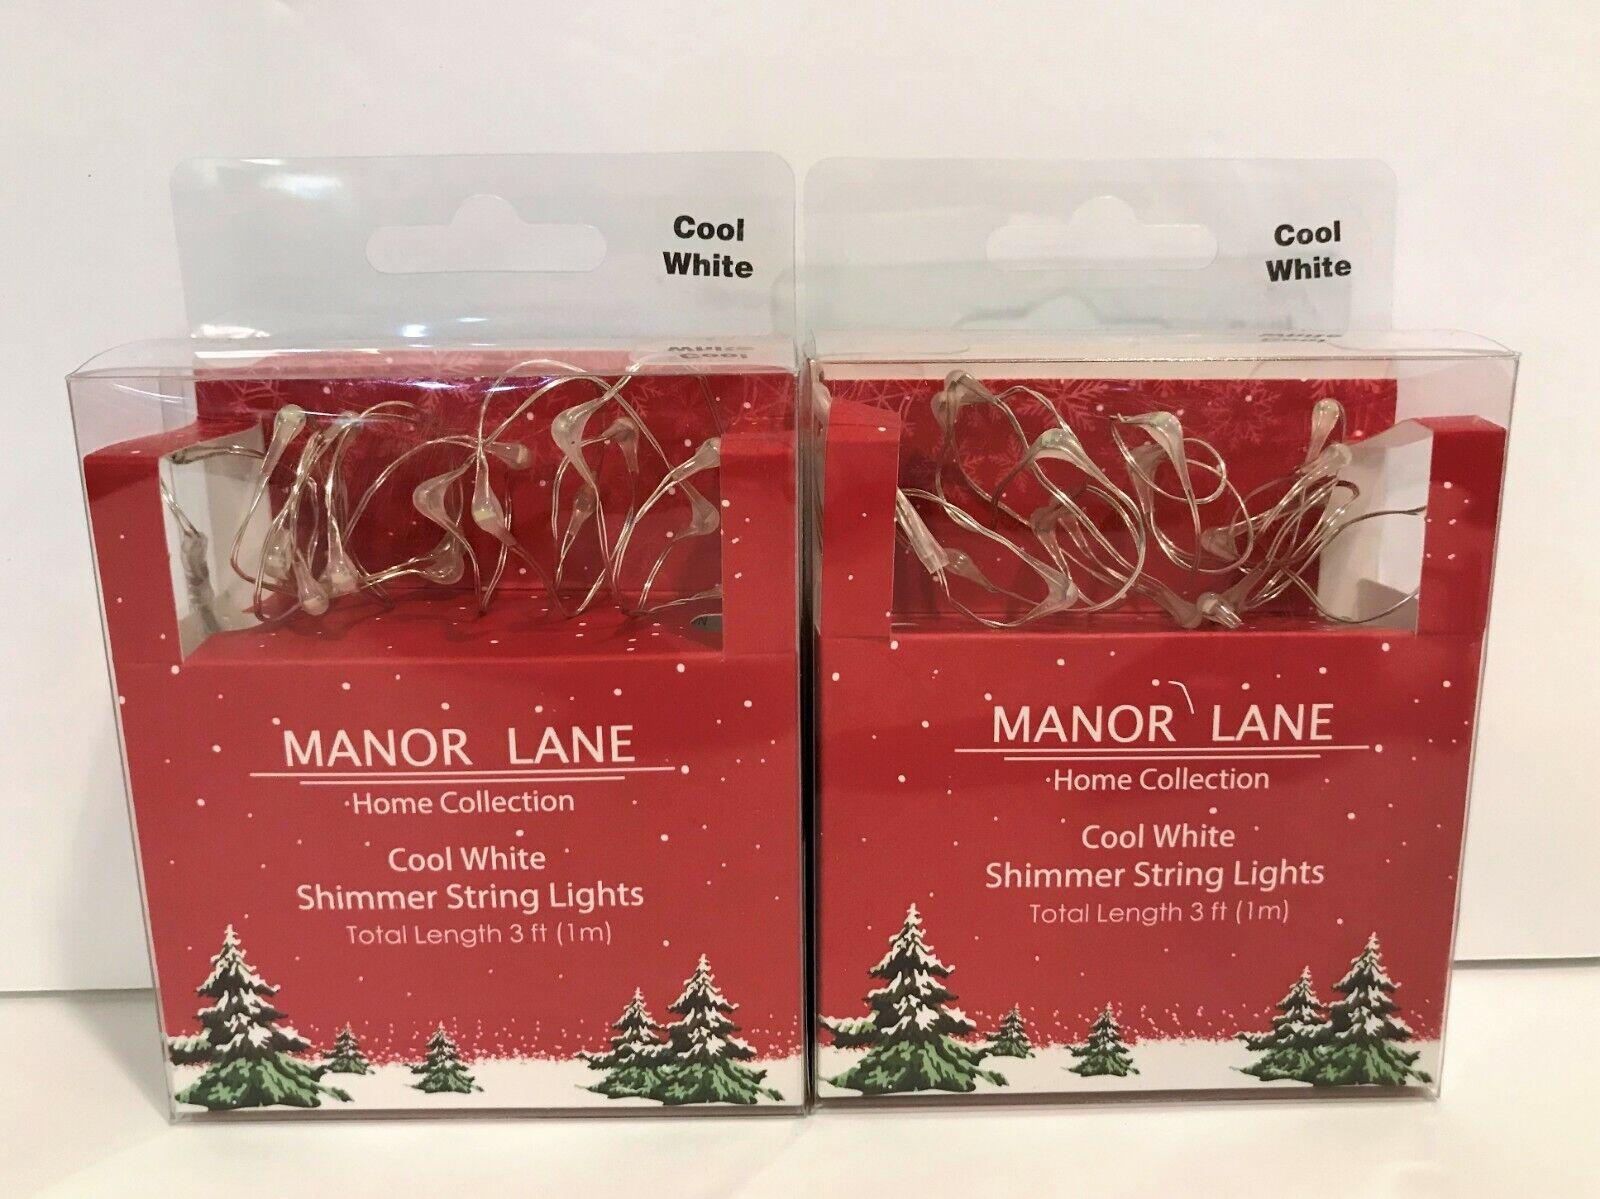 Manor Lane Home Collection Light Amber Shimmer String Lights 3 ft 1m